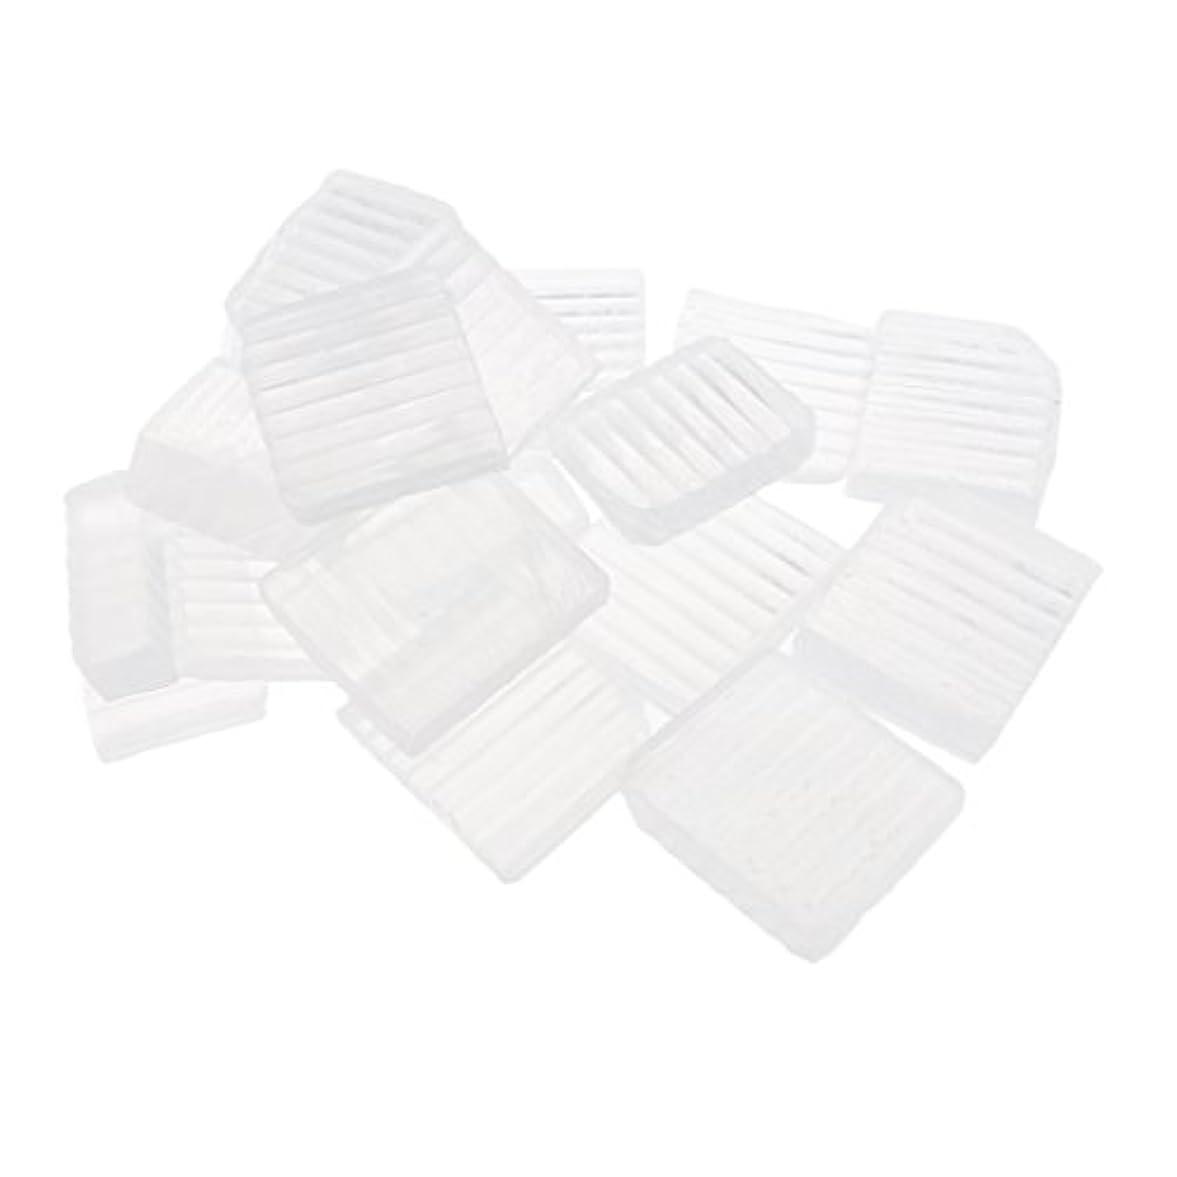 Baoblaze 透明 石鹸ベース DIY 手作り 石鹸 DIYバス用品